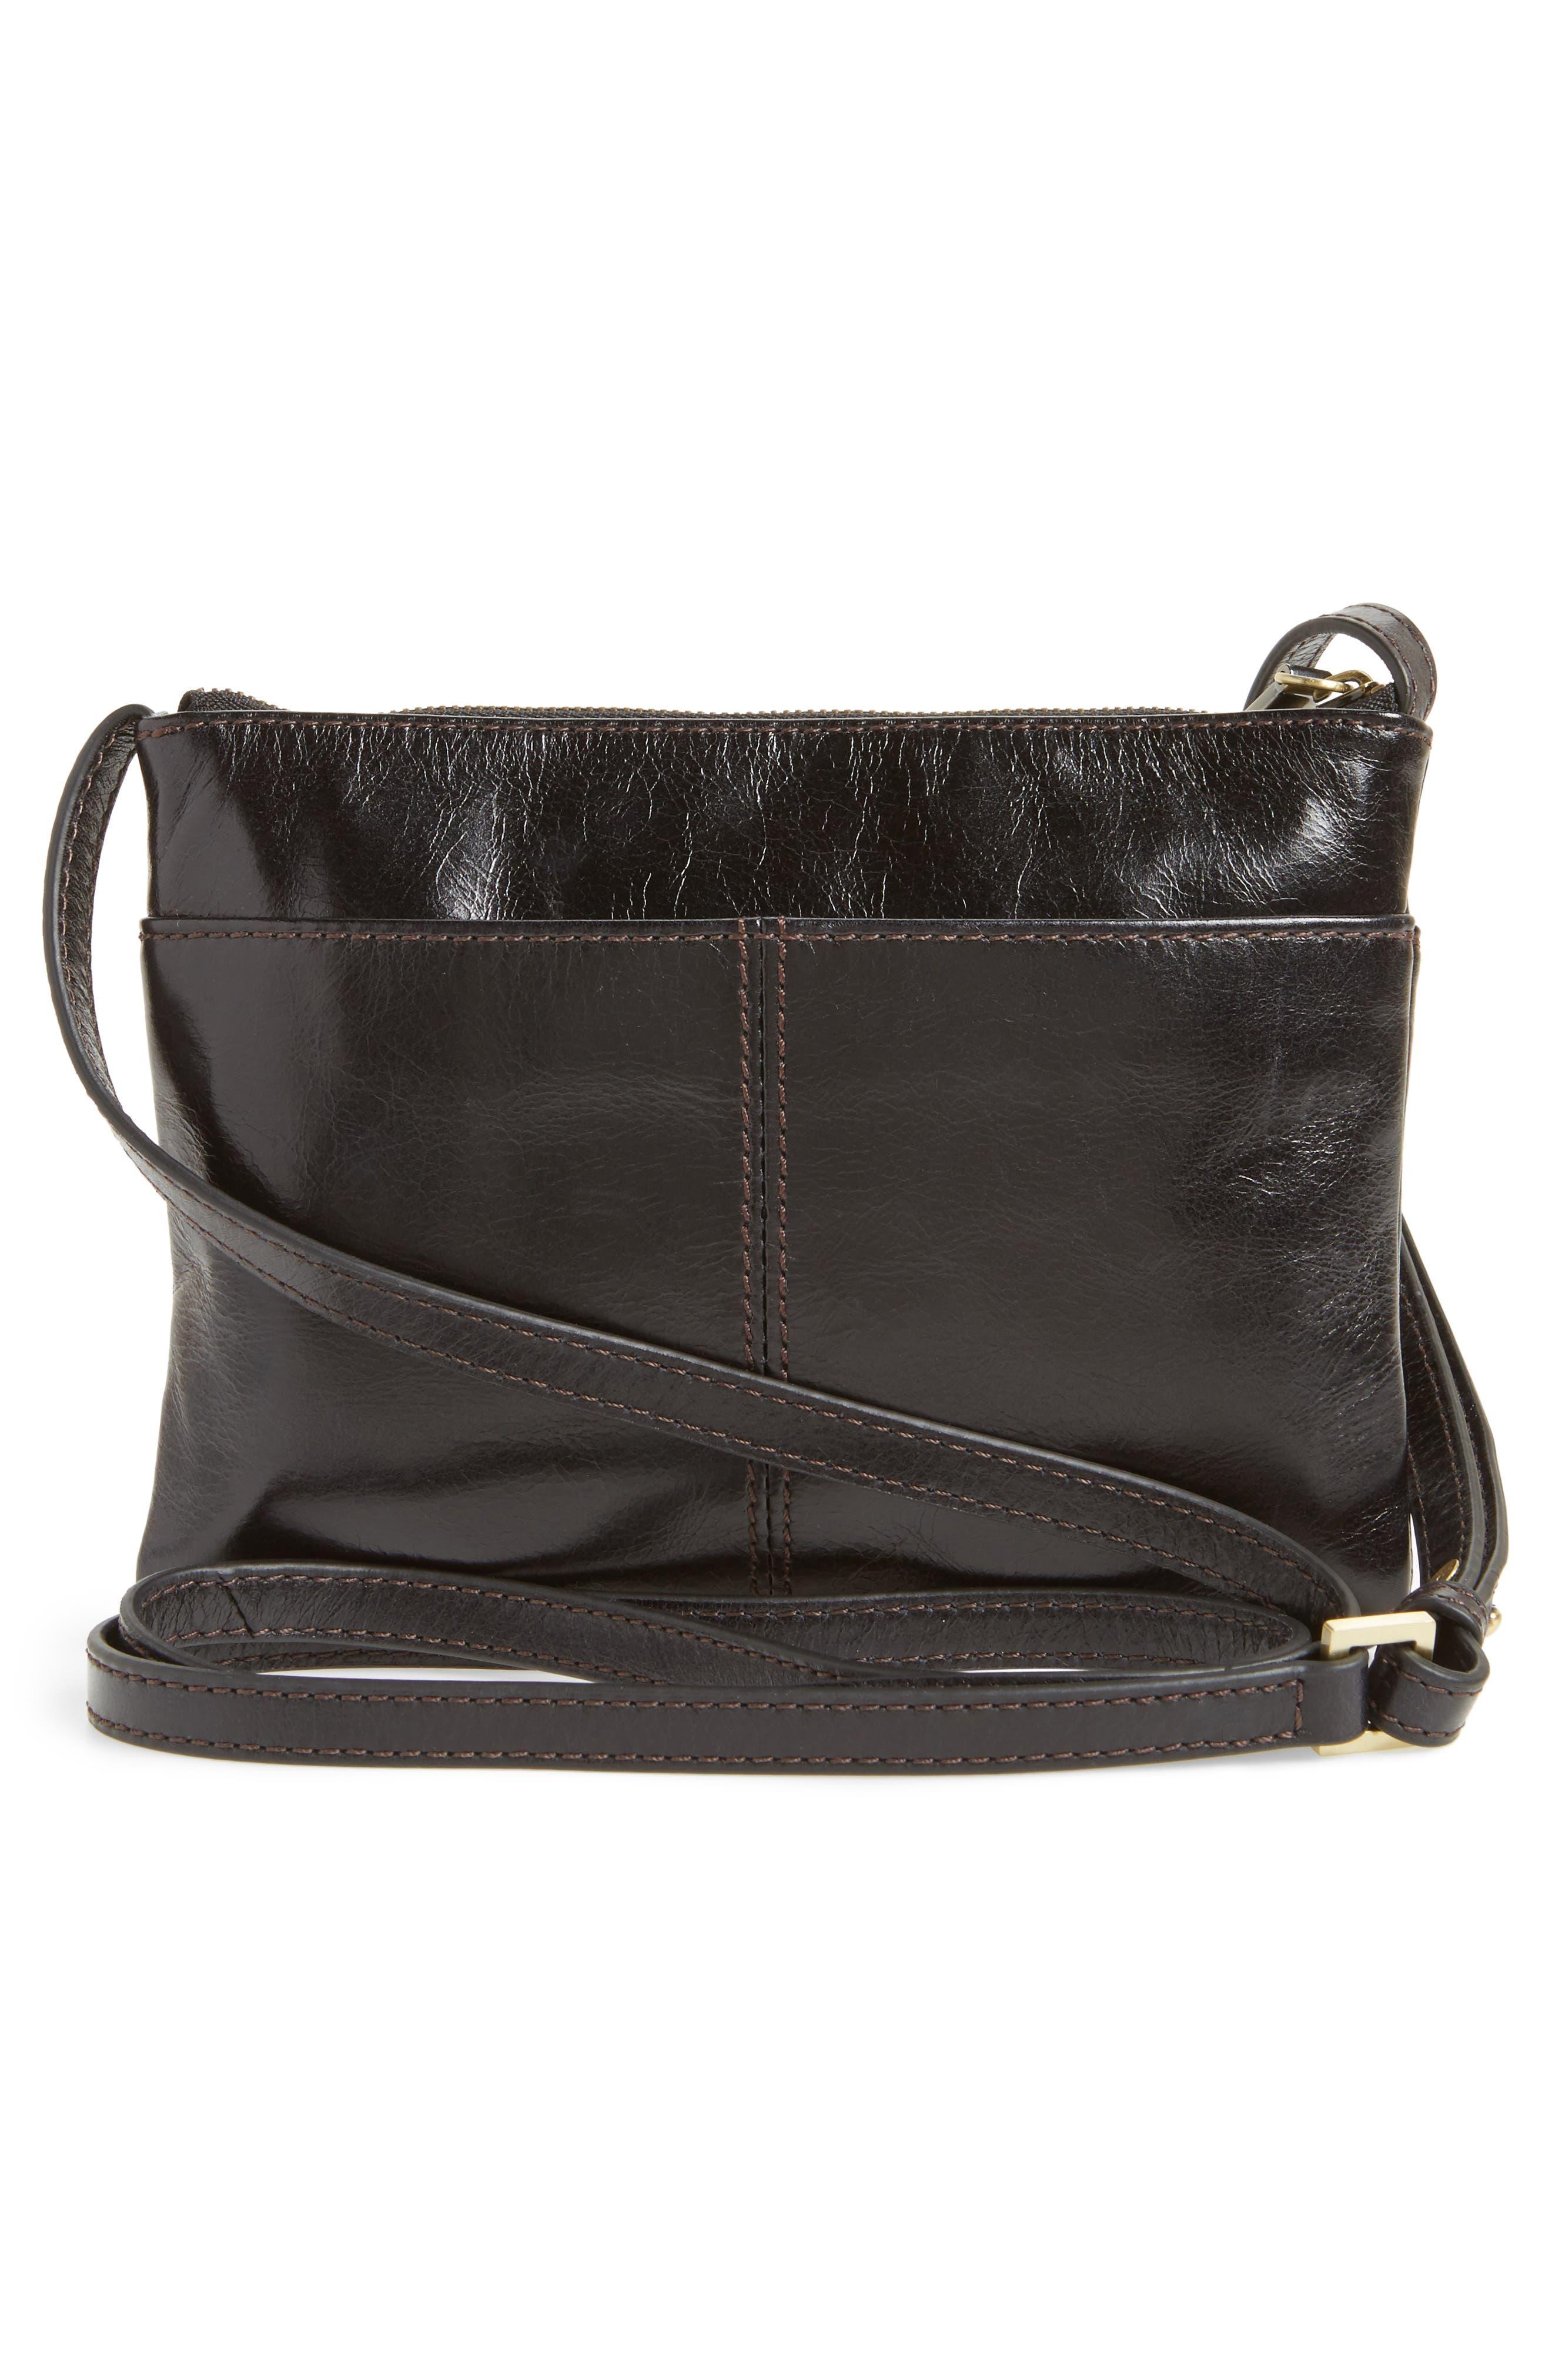 Amble Leather Crossbody Bag,                             Alternate thumbnail 28, color,